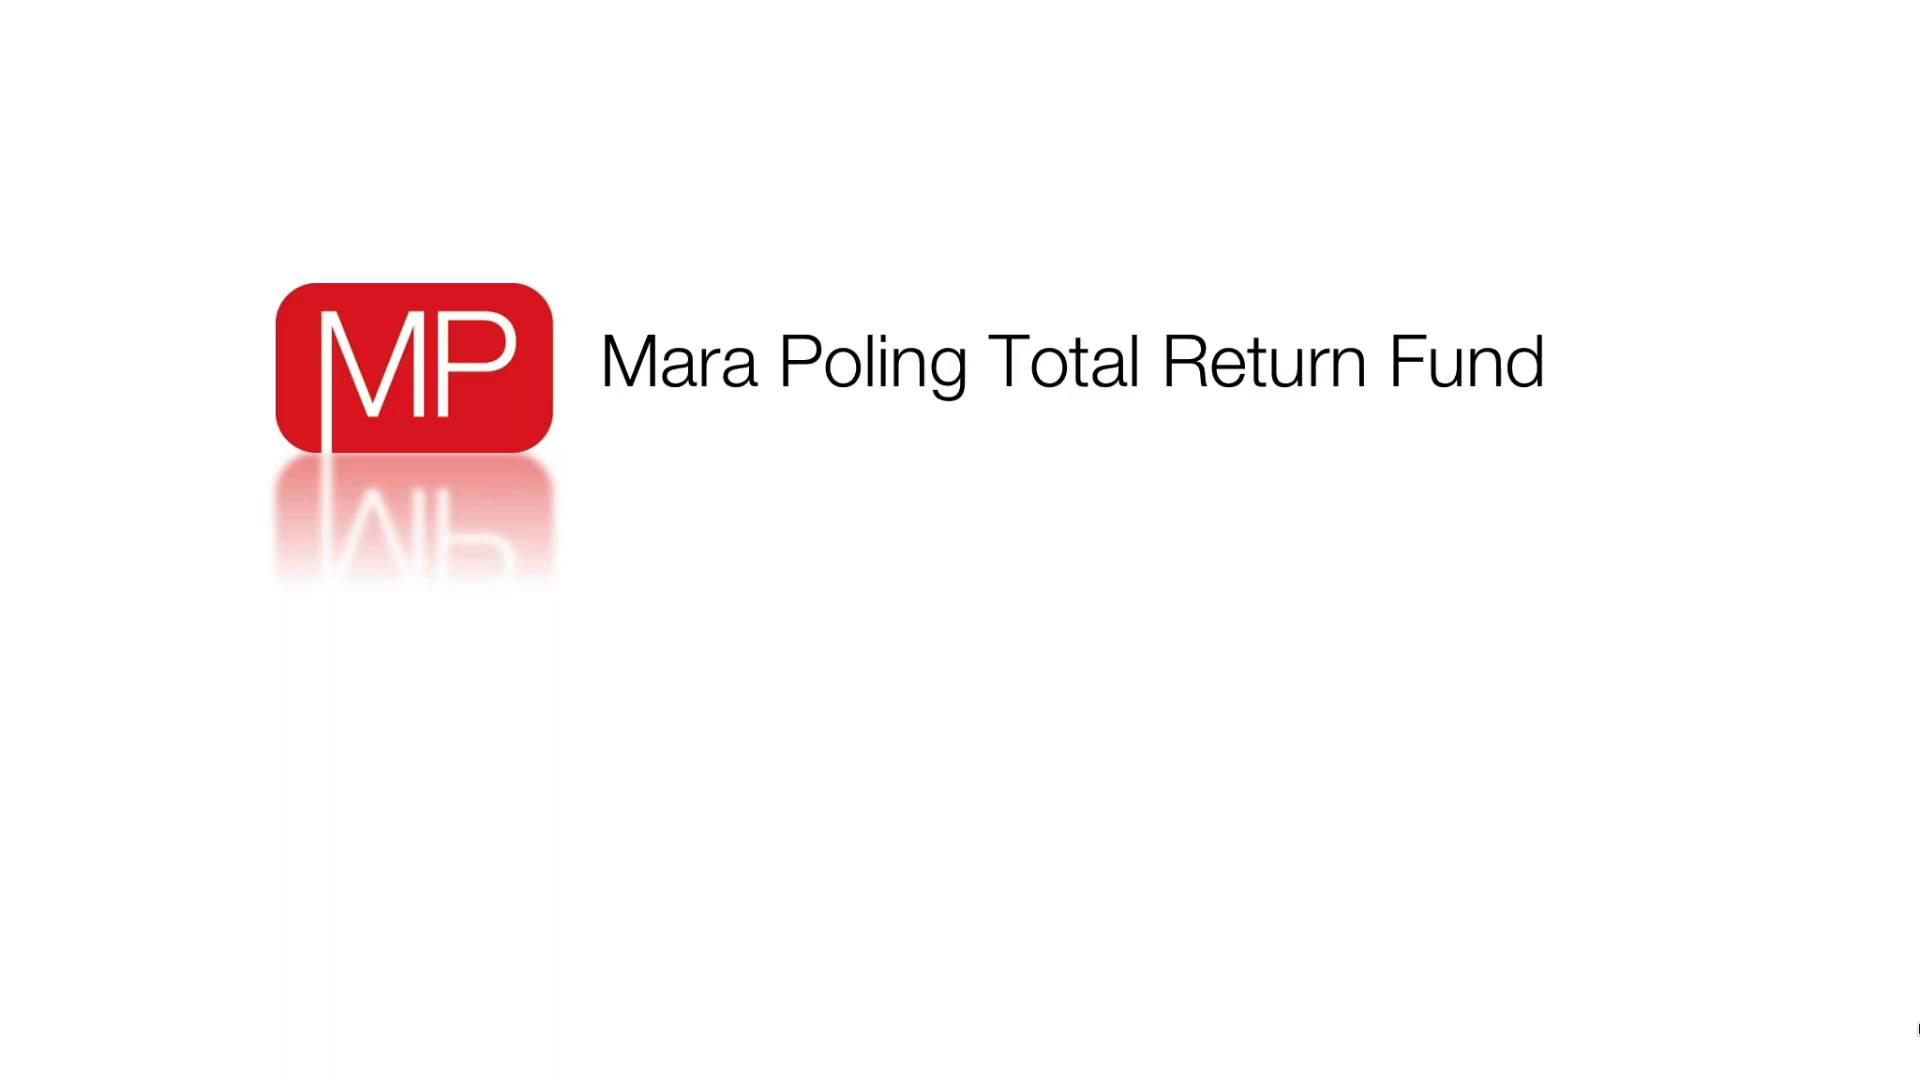 Investment Video - Mara Poling Total Return Fund (2018)